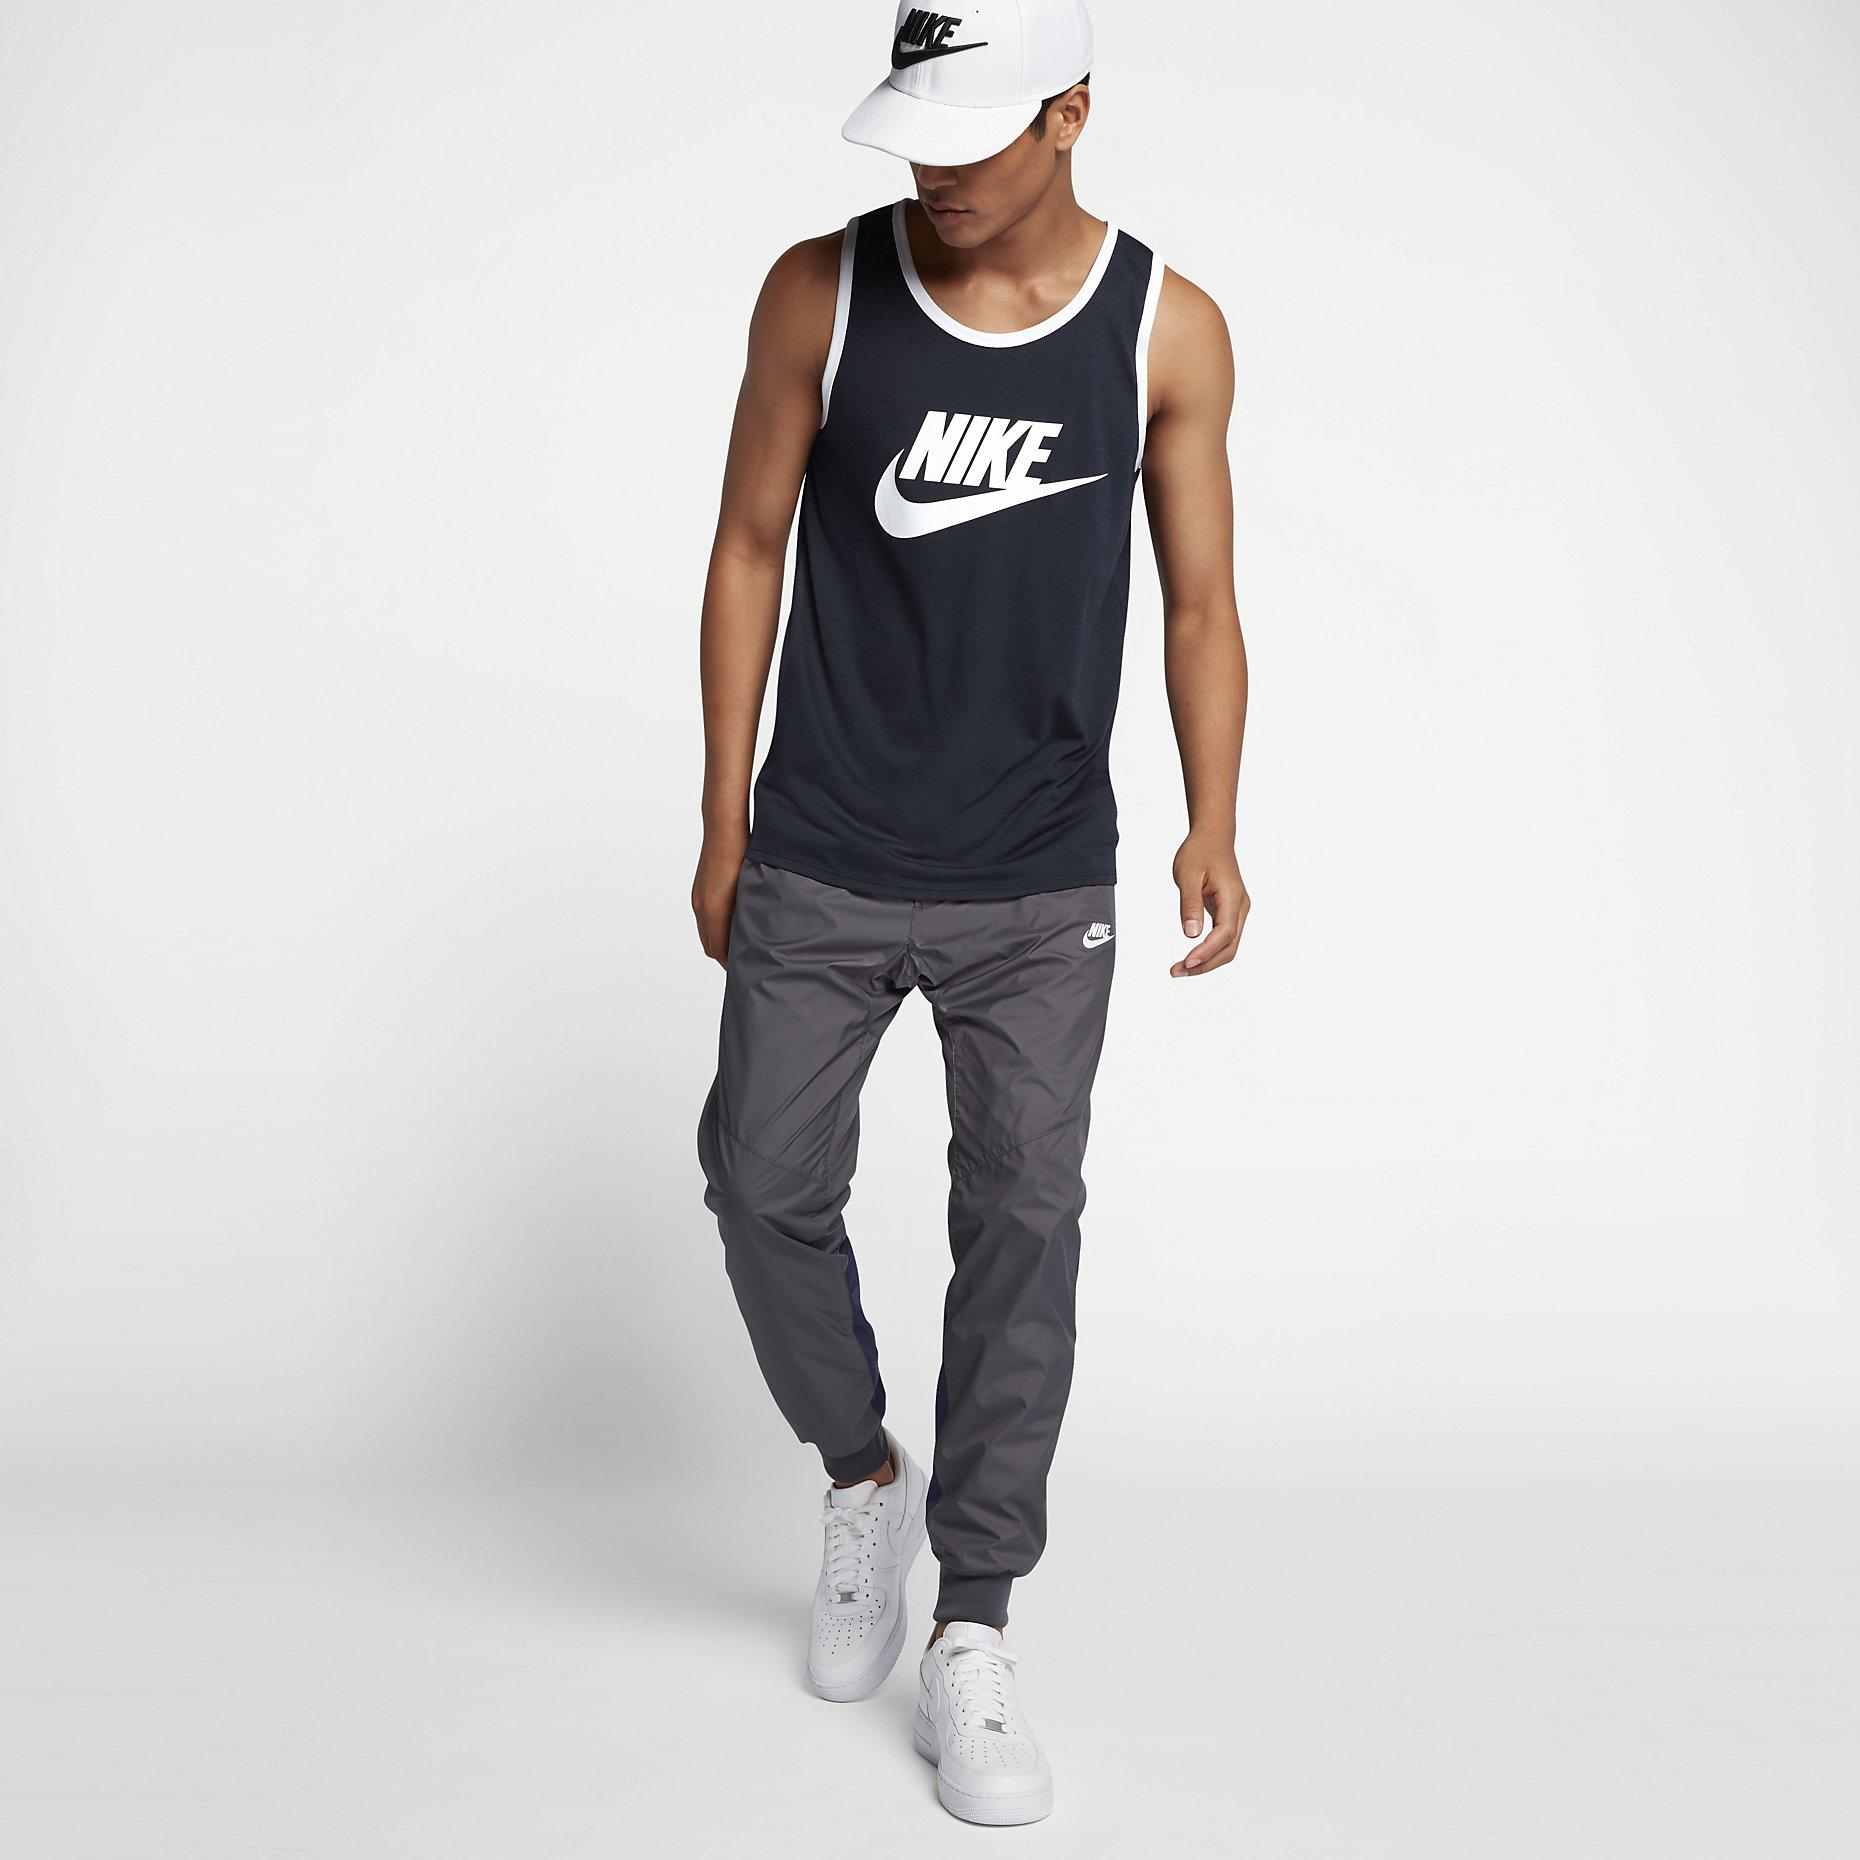 0caf2f827a6f4 Nike Mens Sportswear Ace Logo Tank Top - Obsidian White - Tennisnuts.com